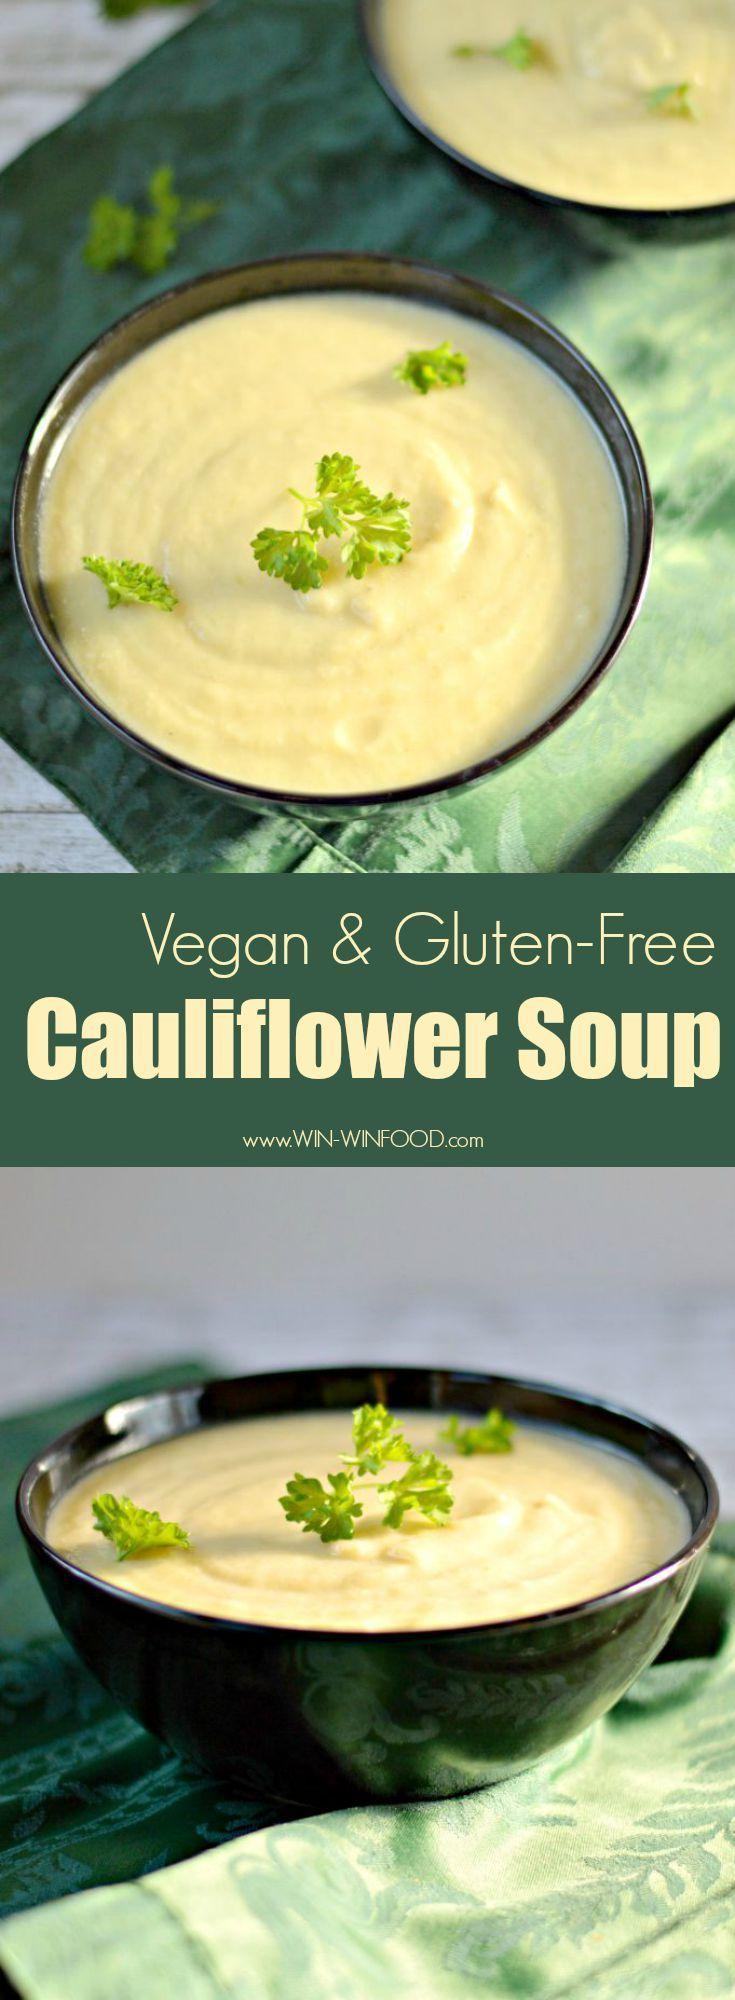 Soup Recipe: Vegan Cauliflower Soup #vegan #plantbased #healthy #recipe #whatveganseat #glutenfree #soup